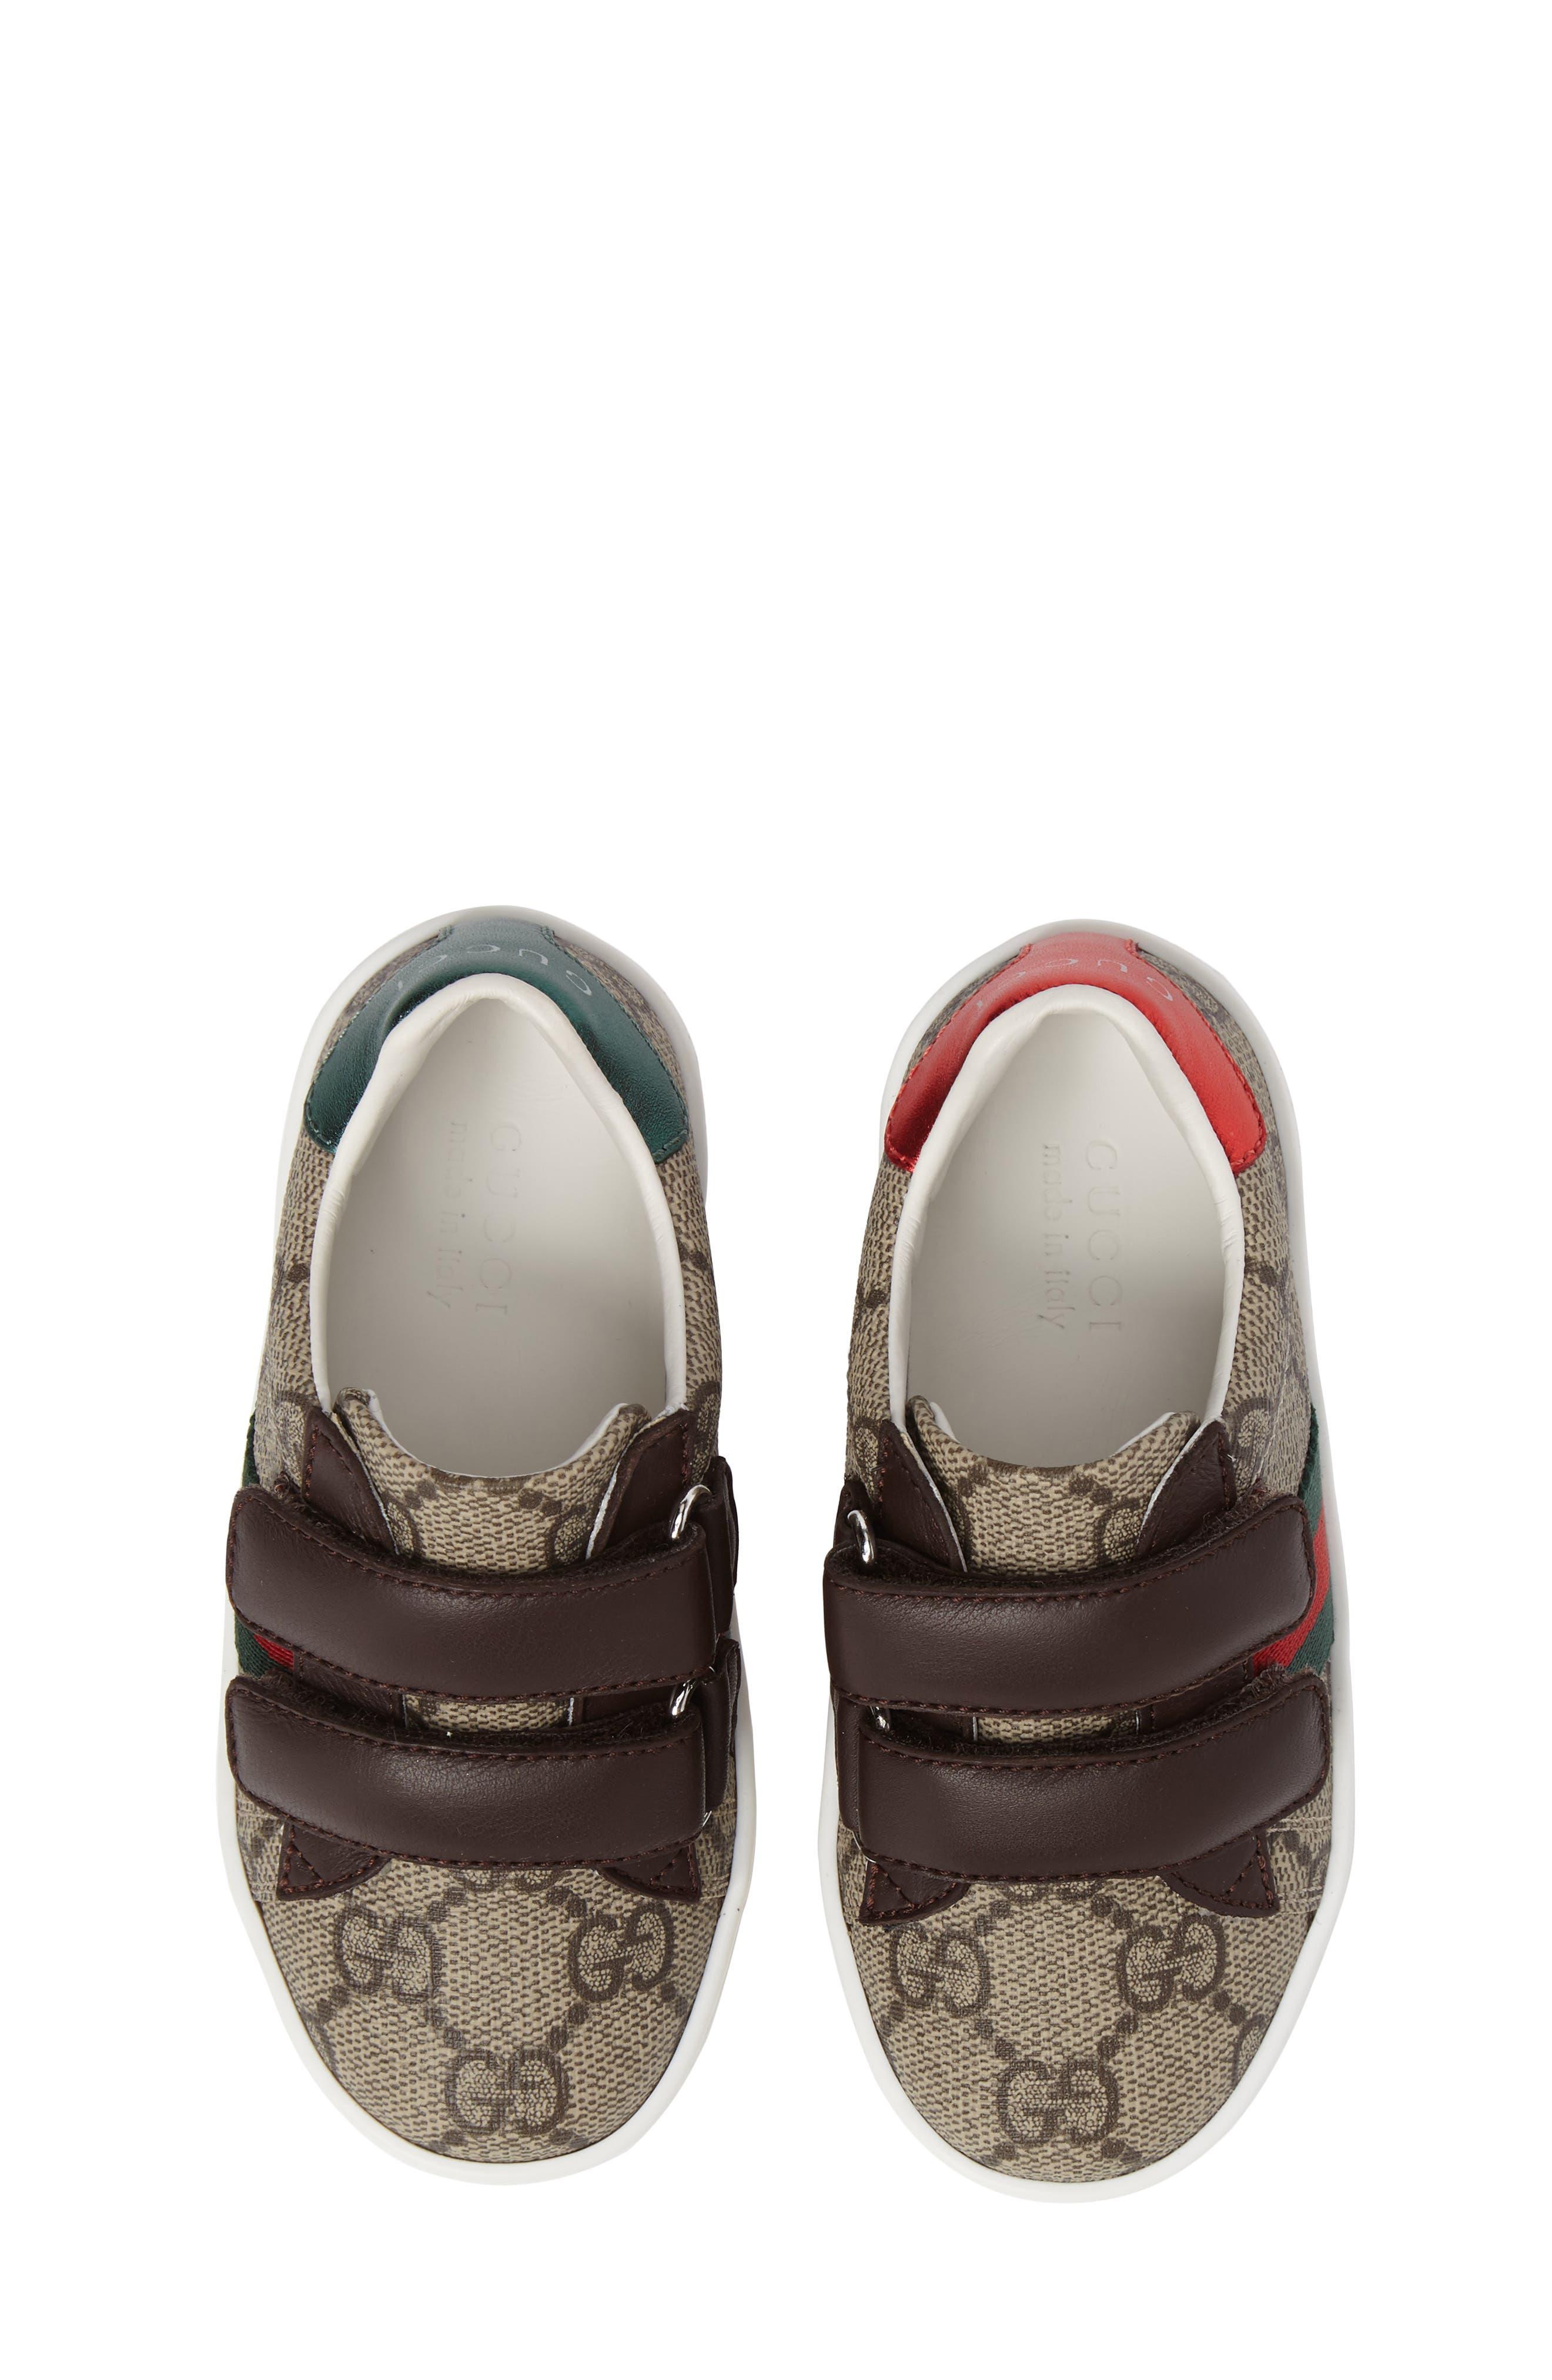 Alternate Image 1 Selected - Gucci New Ace Monogram Sneaker (Baby, Walker, Toddler, Little Kid & Big Kid)